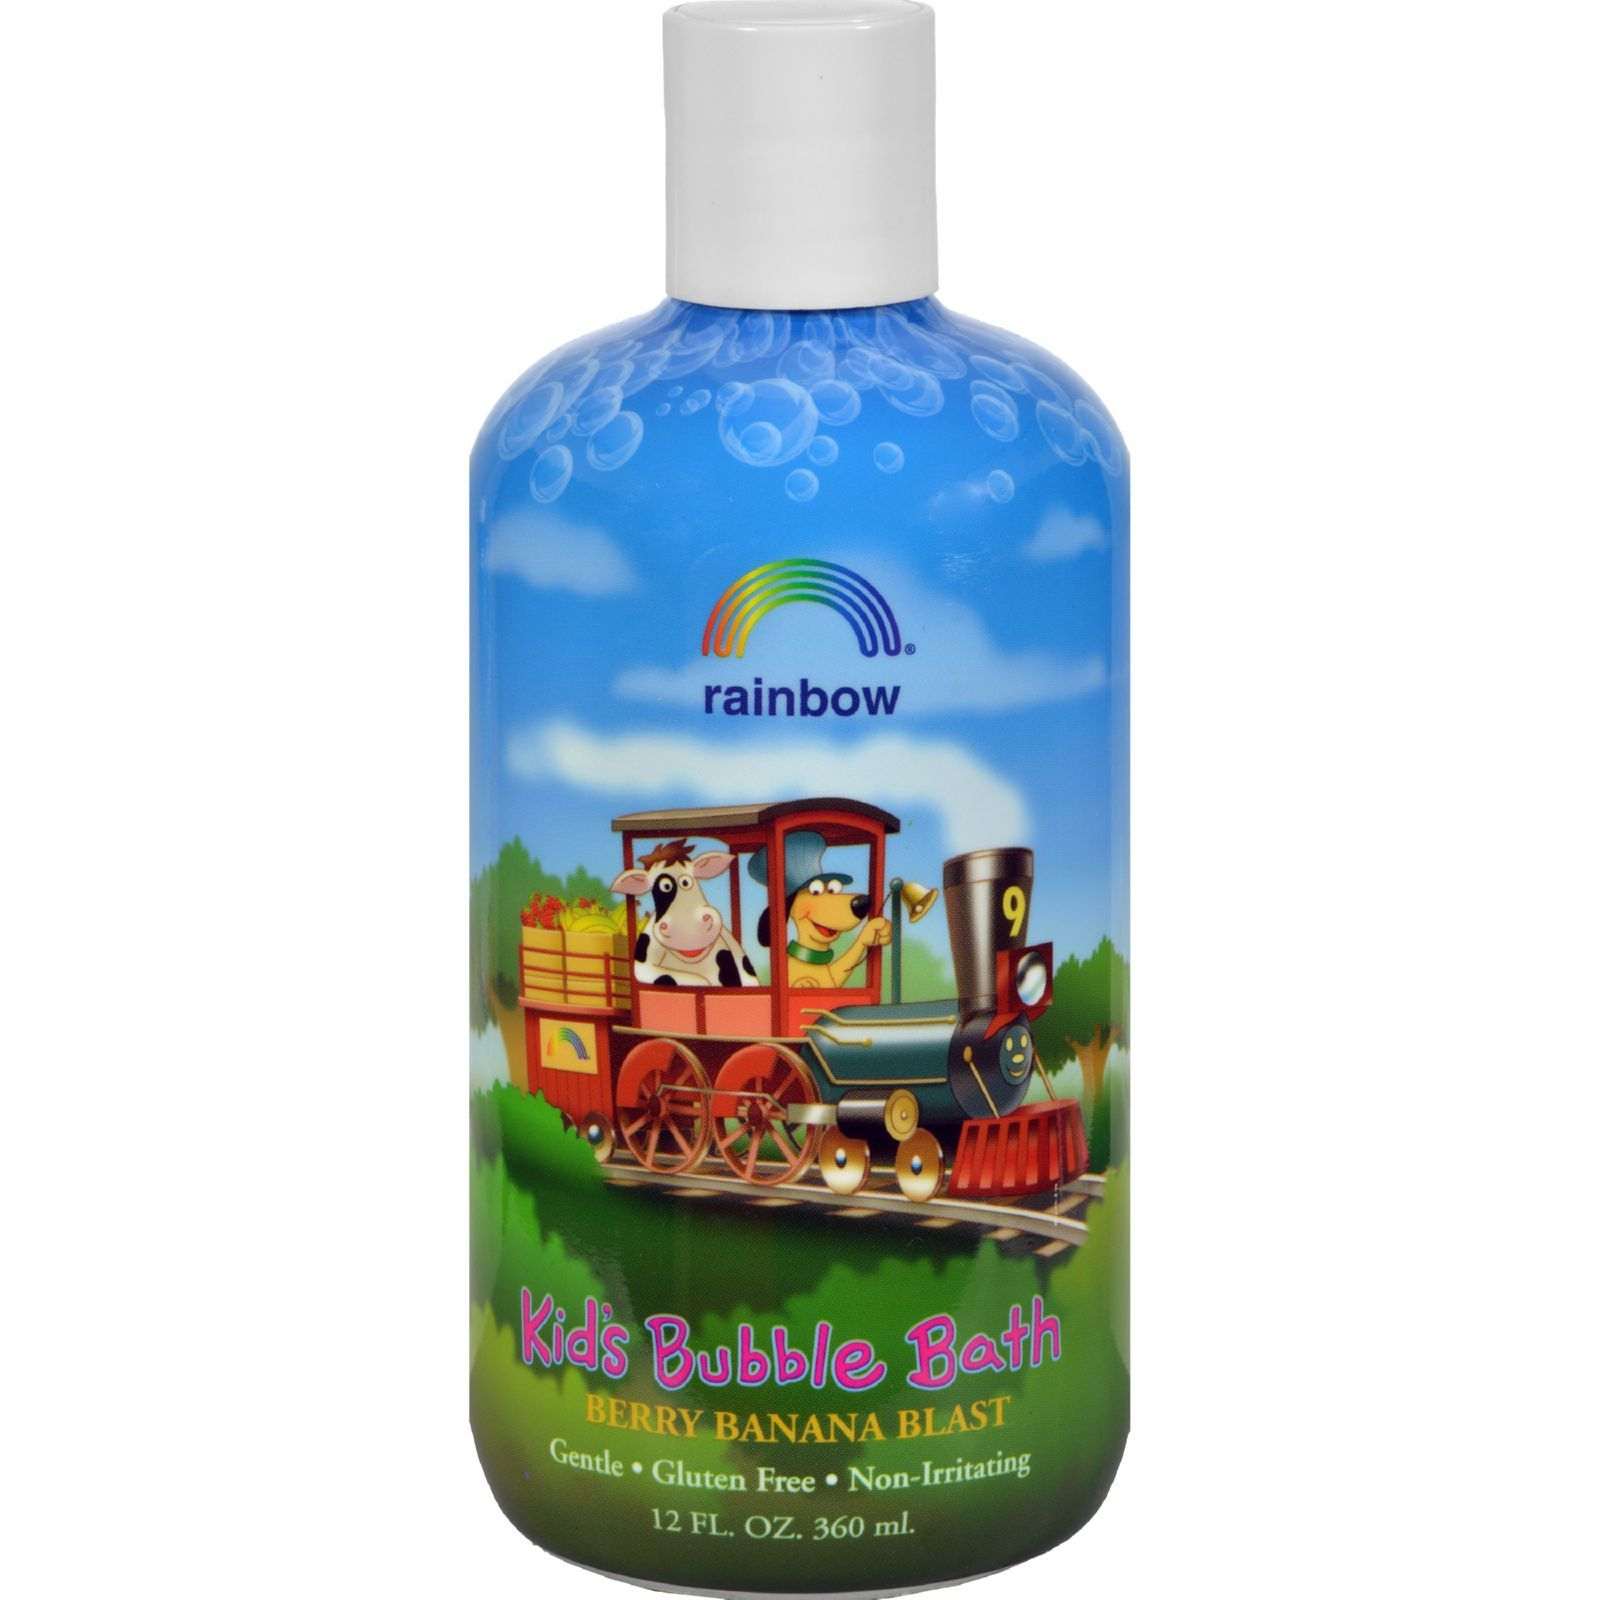 Rainbow Research Organic Herbal Bubble Bath For Kids Berry Banana Blast - 12 fl oz